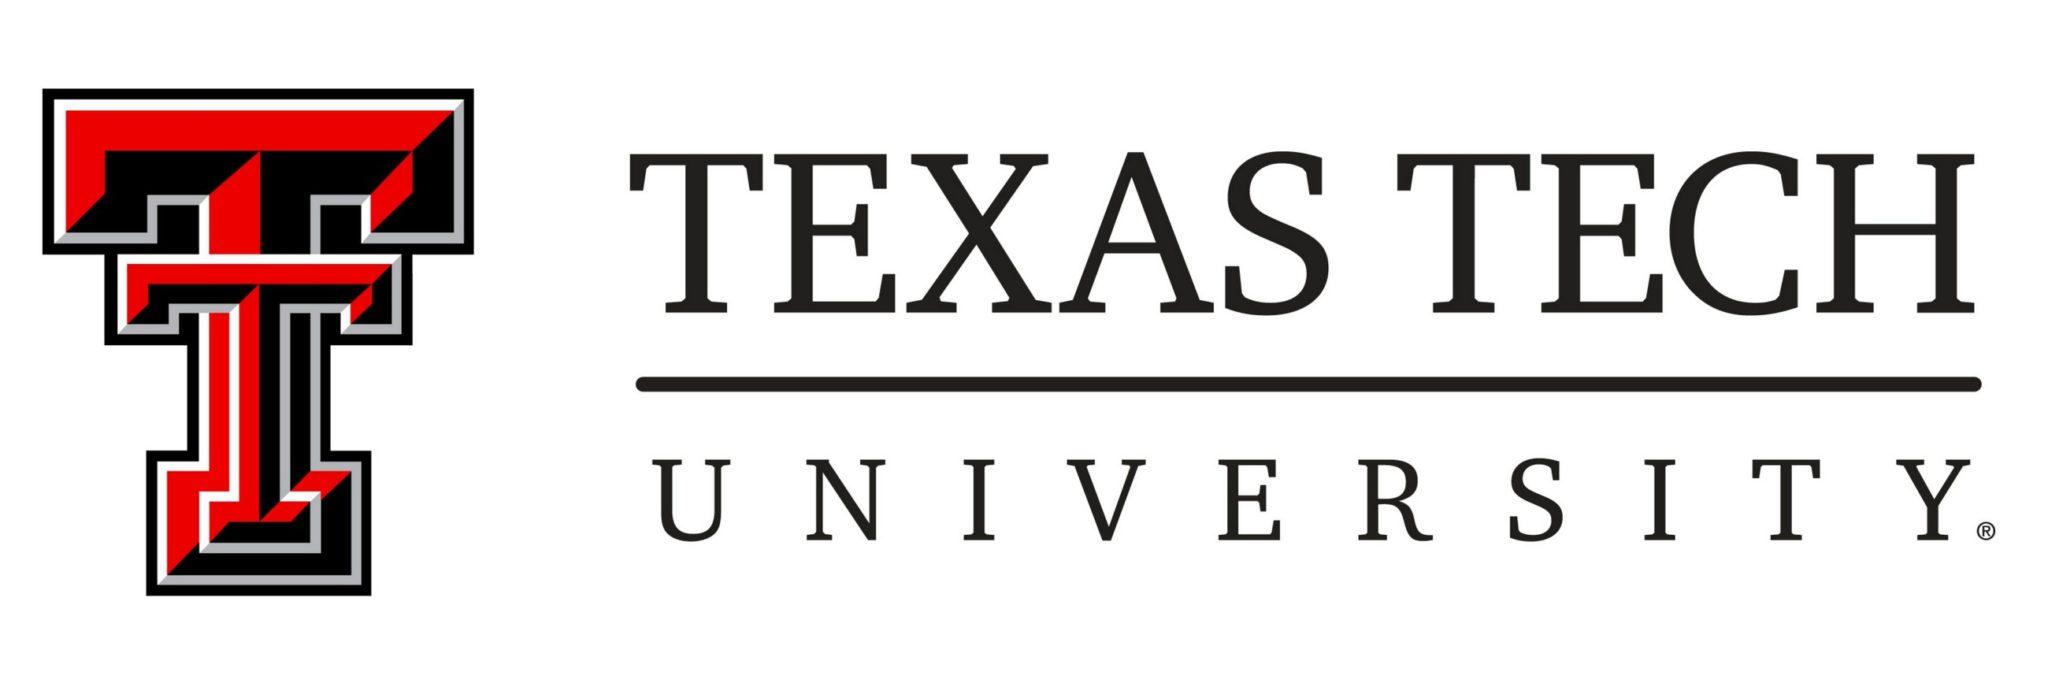 Texas Tech University Business Analytics Graduate Certificate